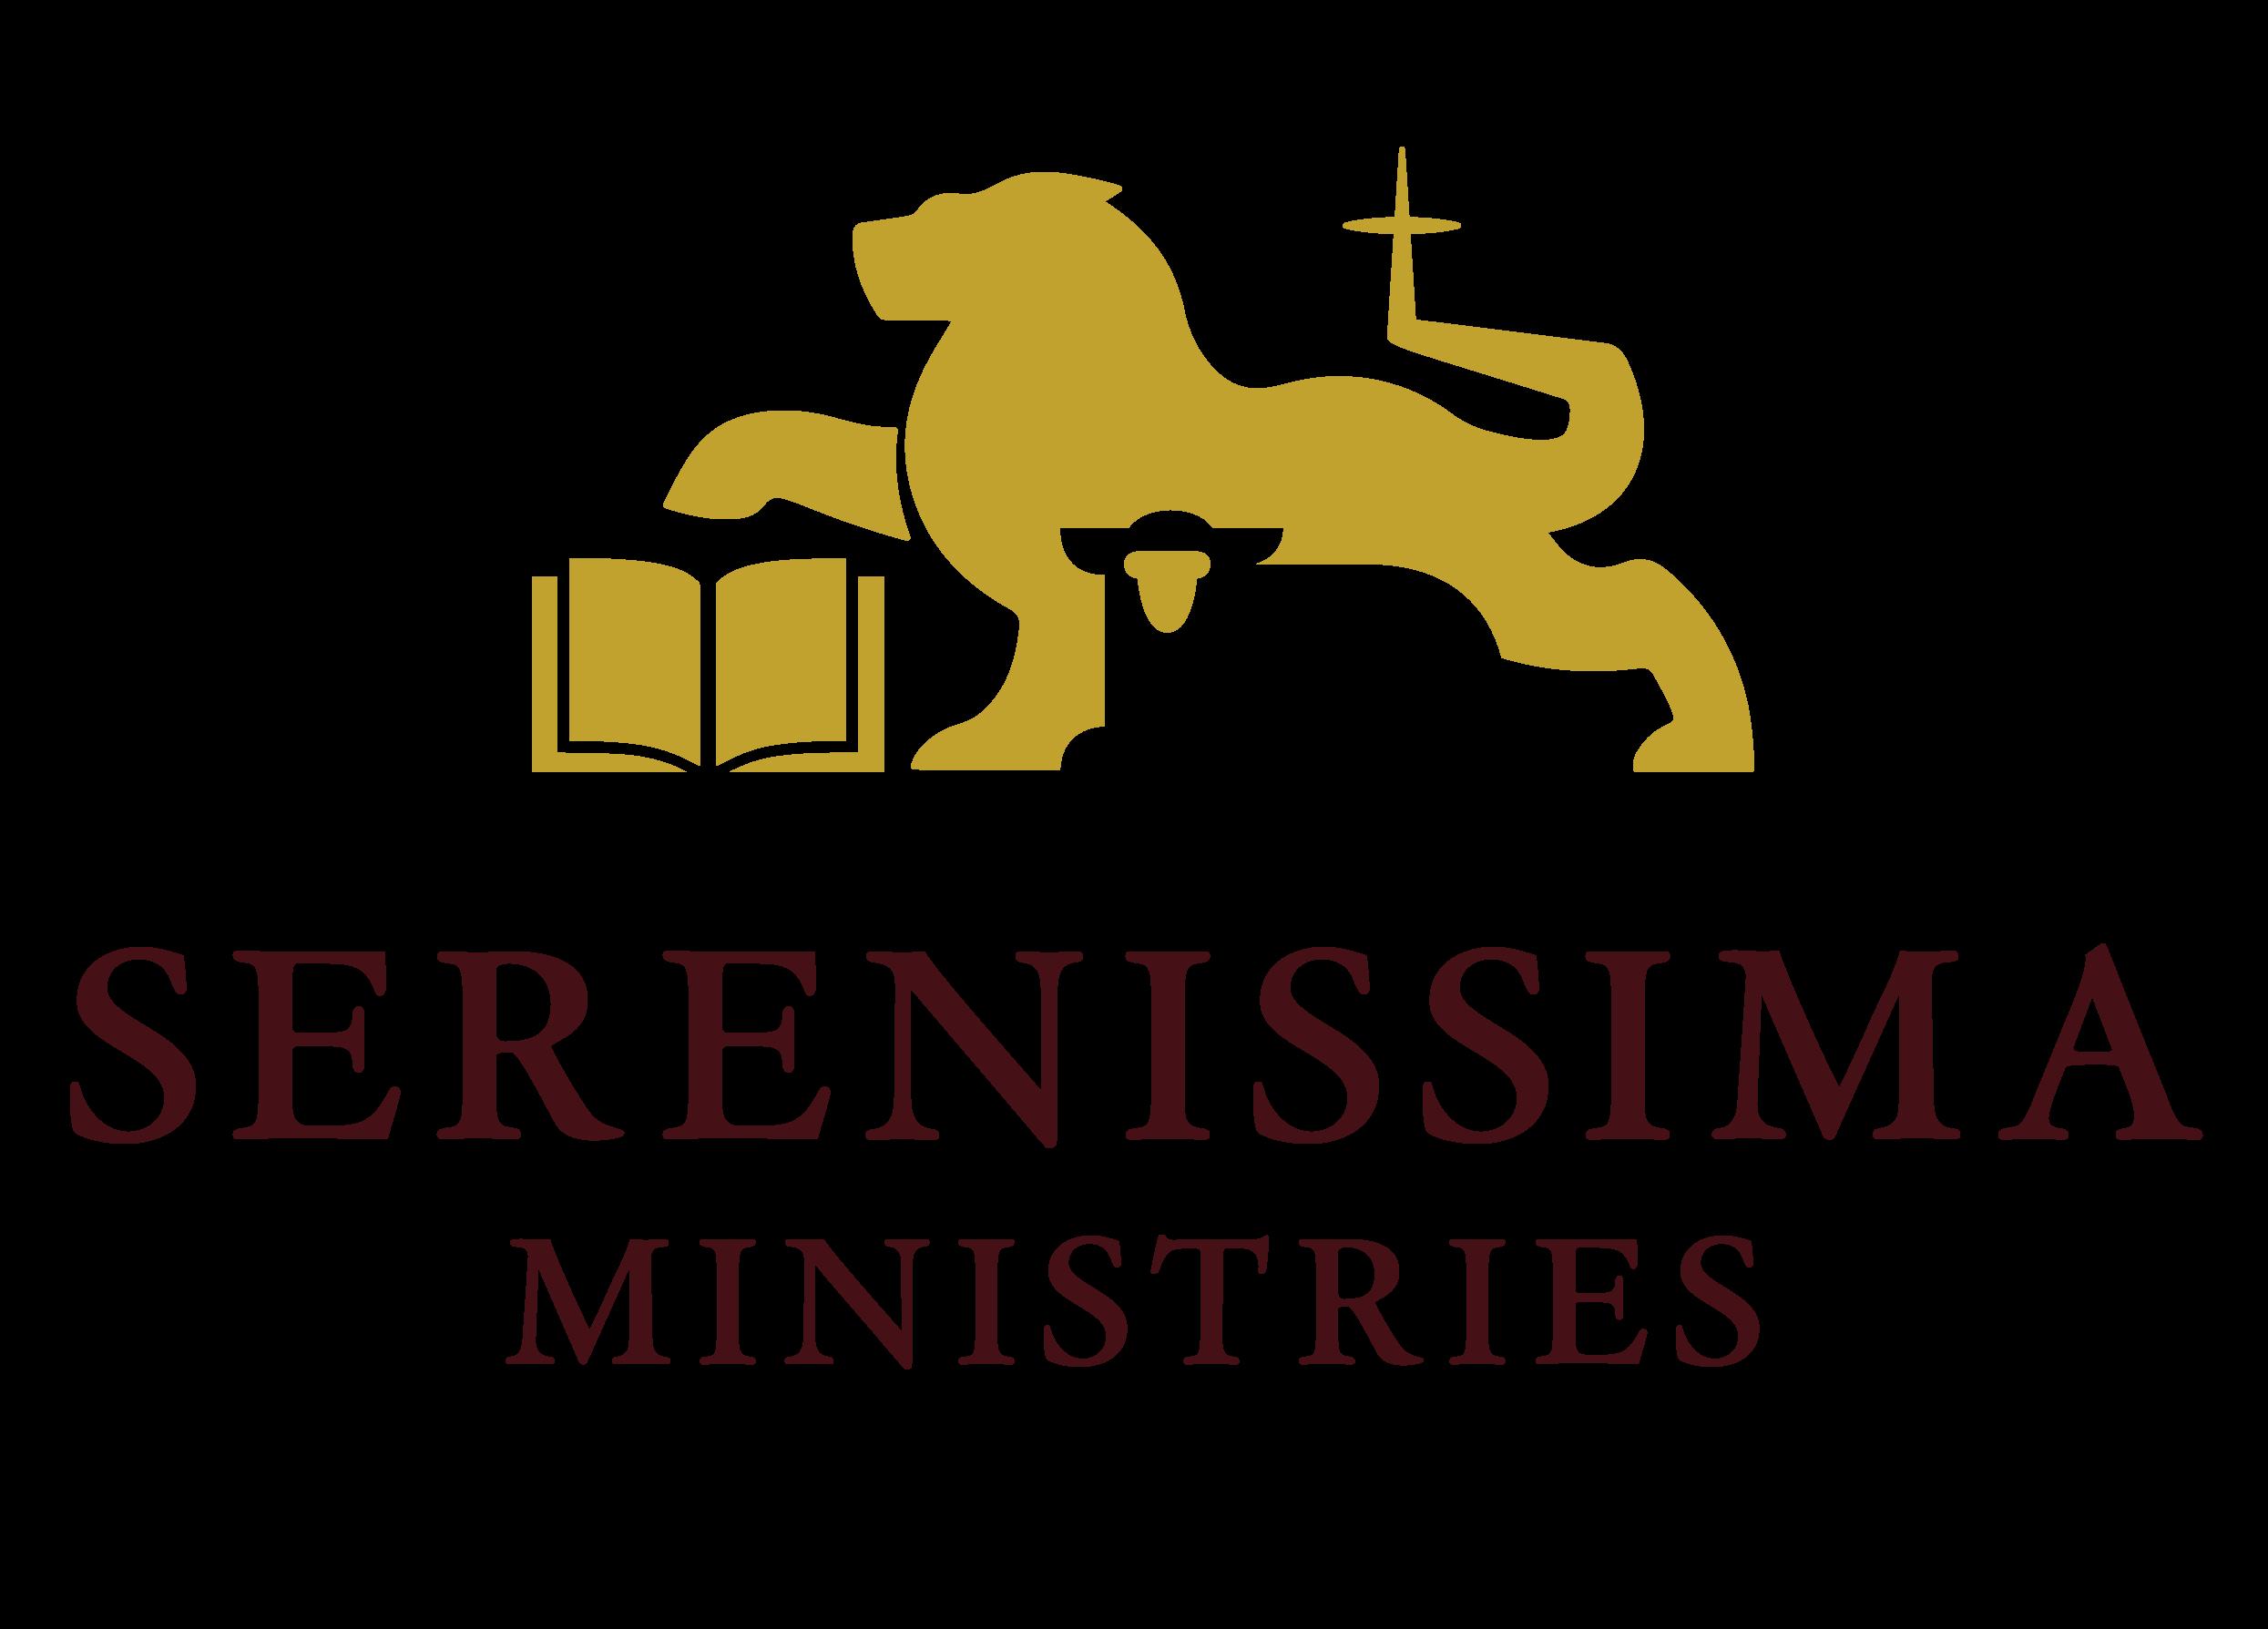 Serenissima Ministries